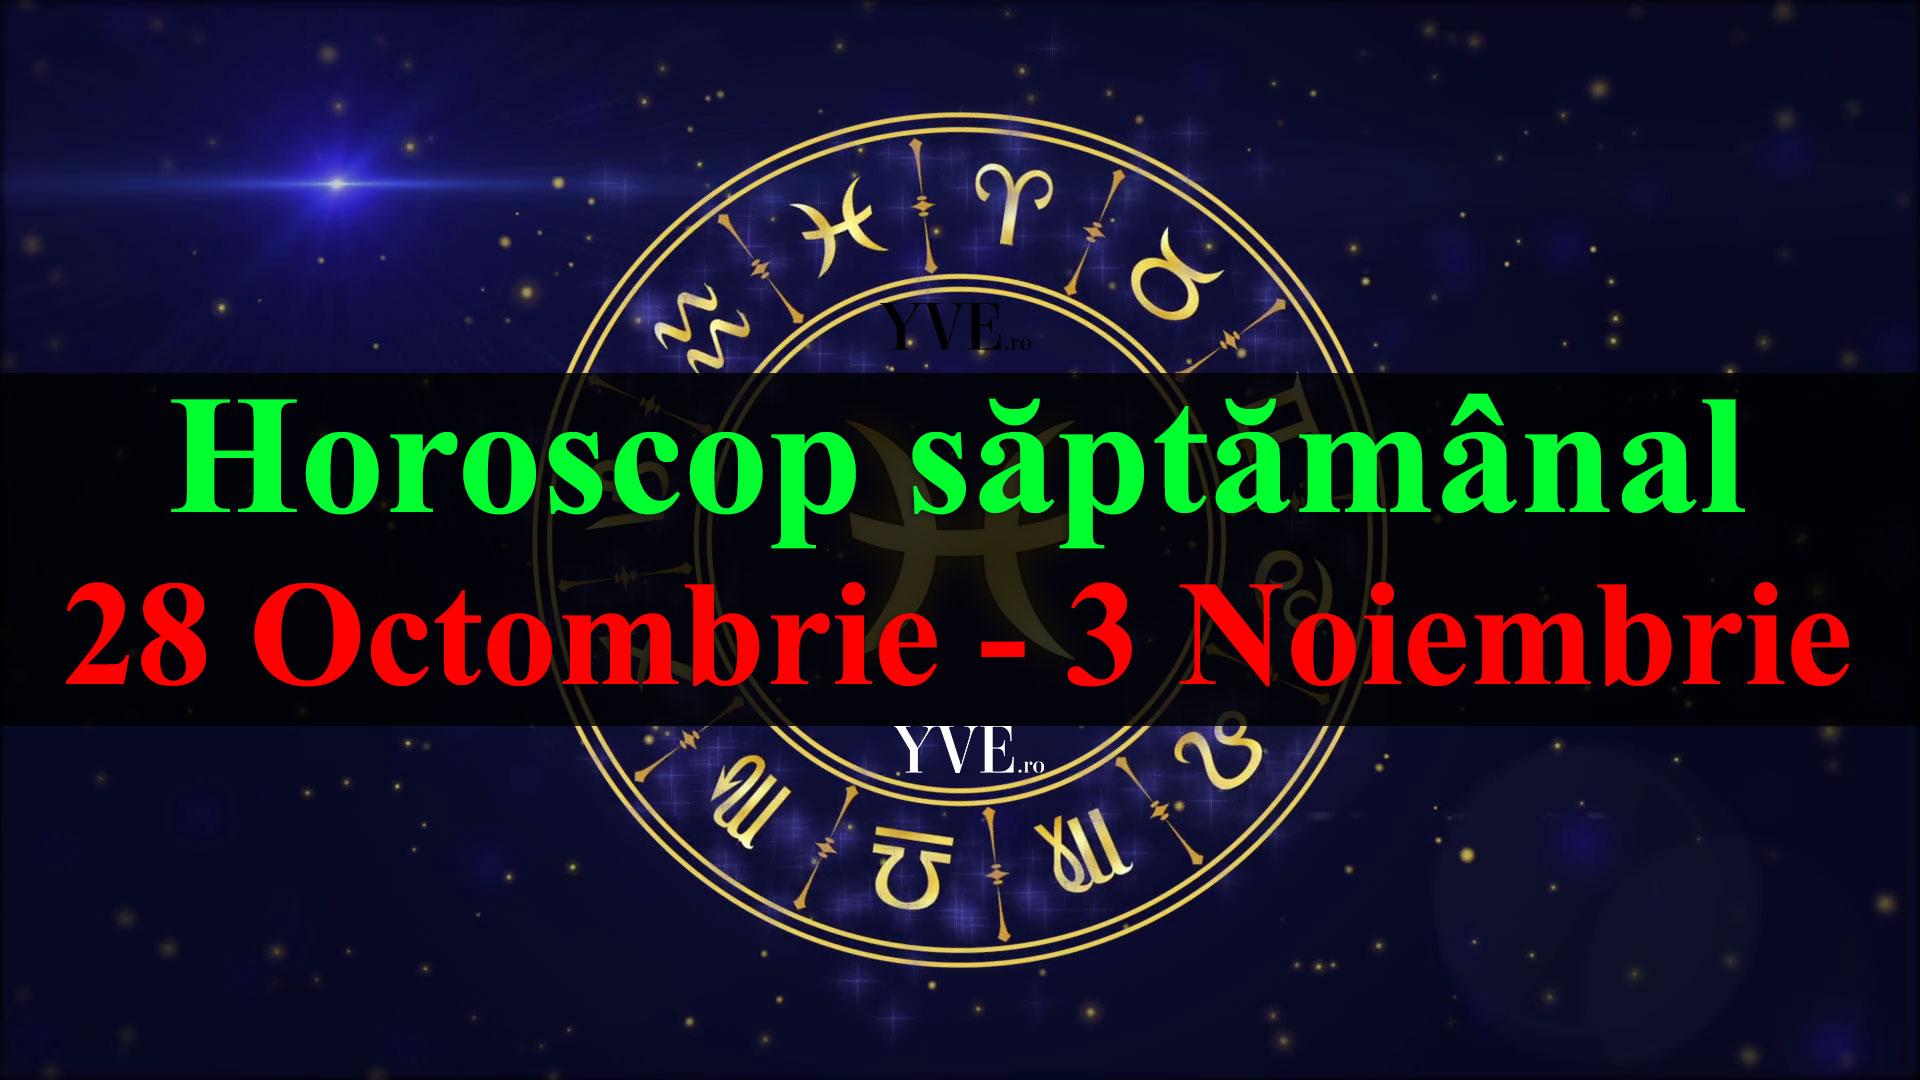 Horoscop saptamanal 28 Octombrie - 3 Noiembrie 2019